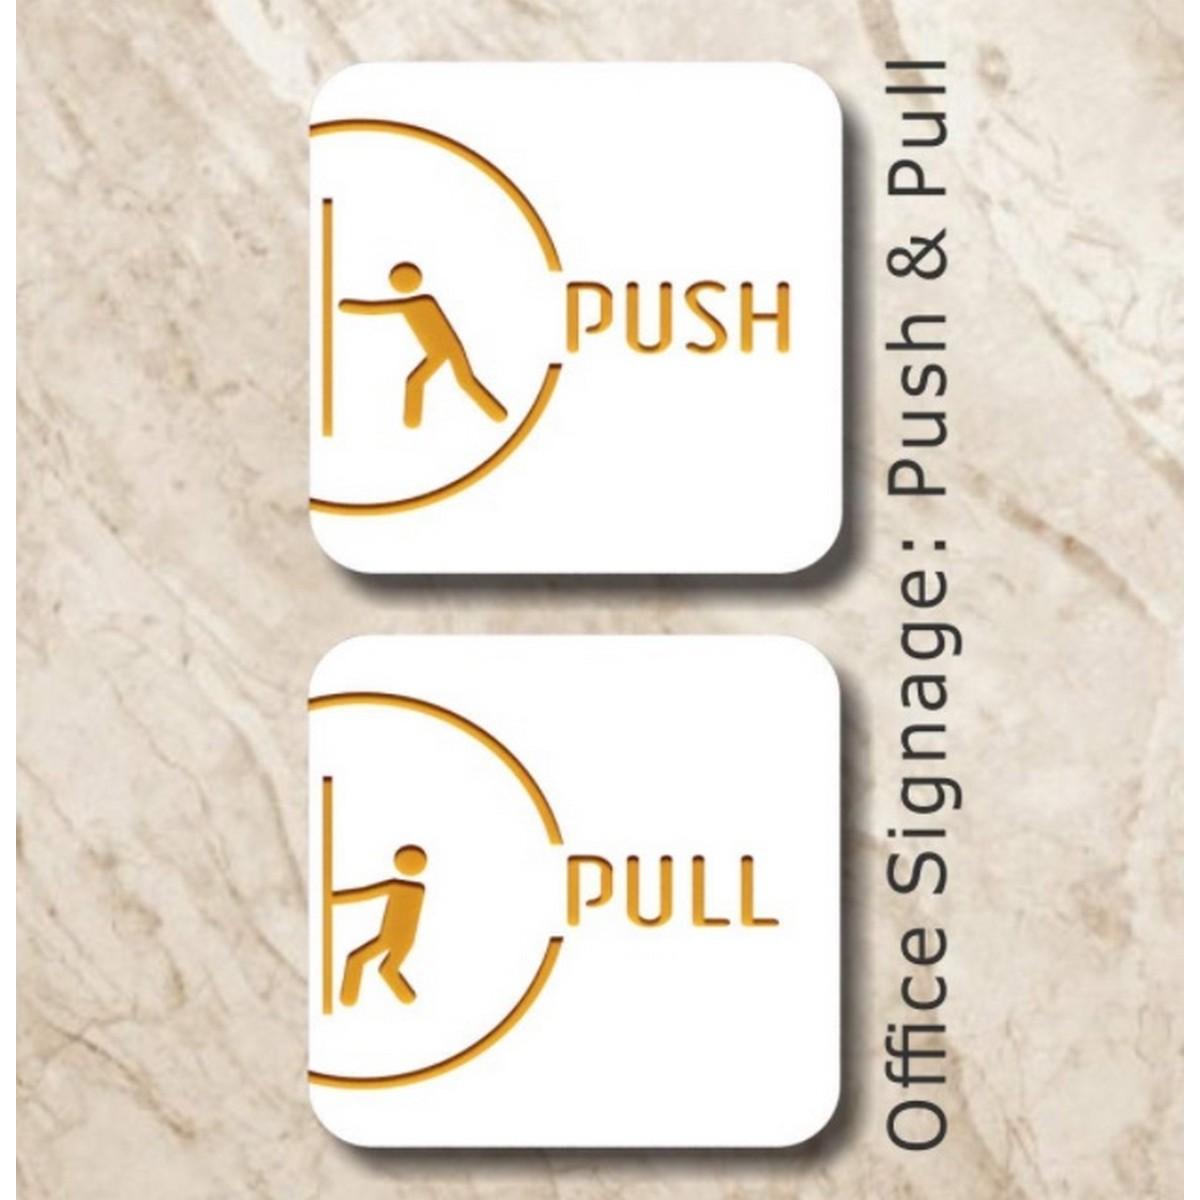 PushPull Acrylic Door Signages  PushPull Acrylic Door Signages